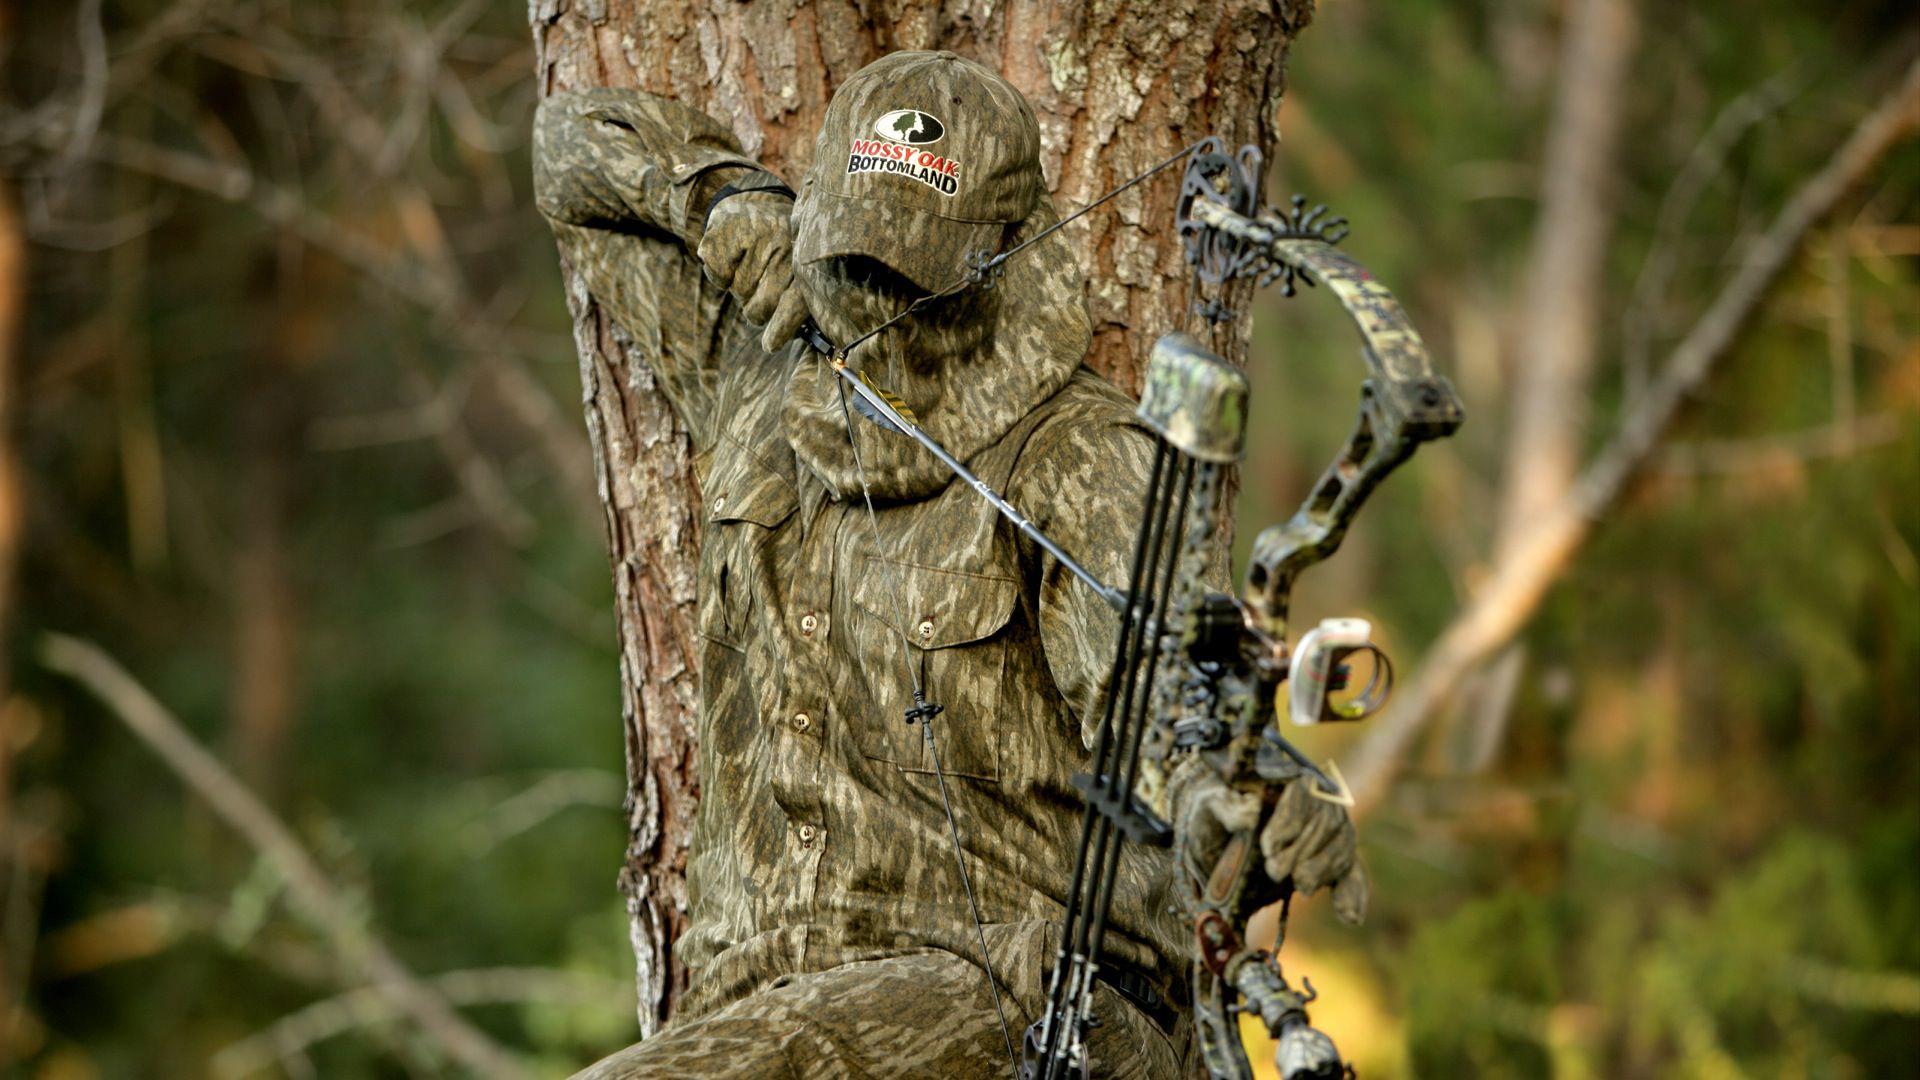 Mossy Oak Bottomland Bow Hunting - HD Wallpaper